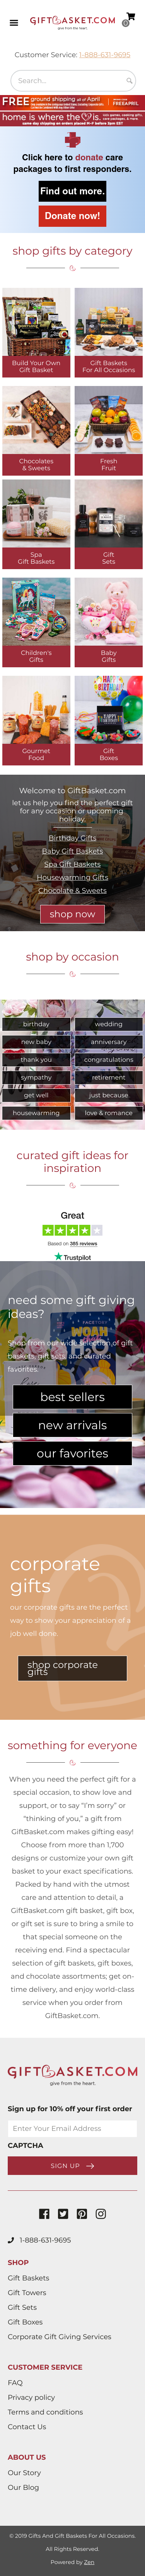 GiftBasket.com Coupon